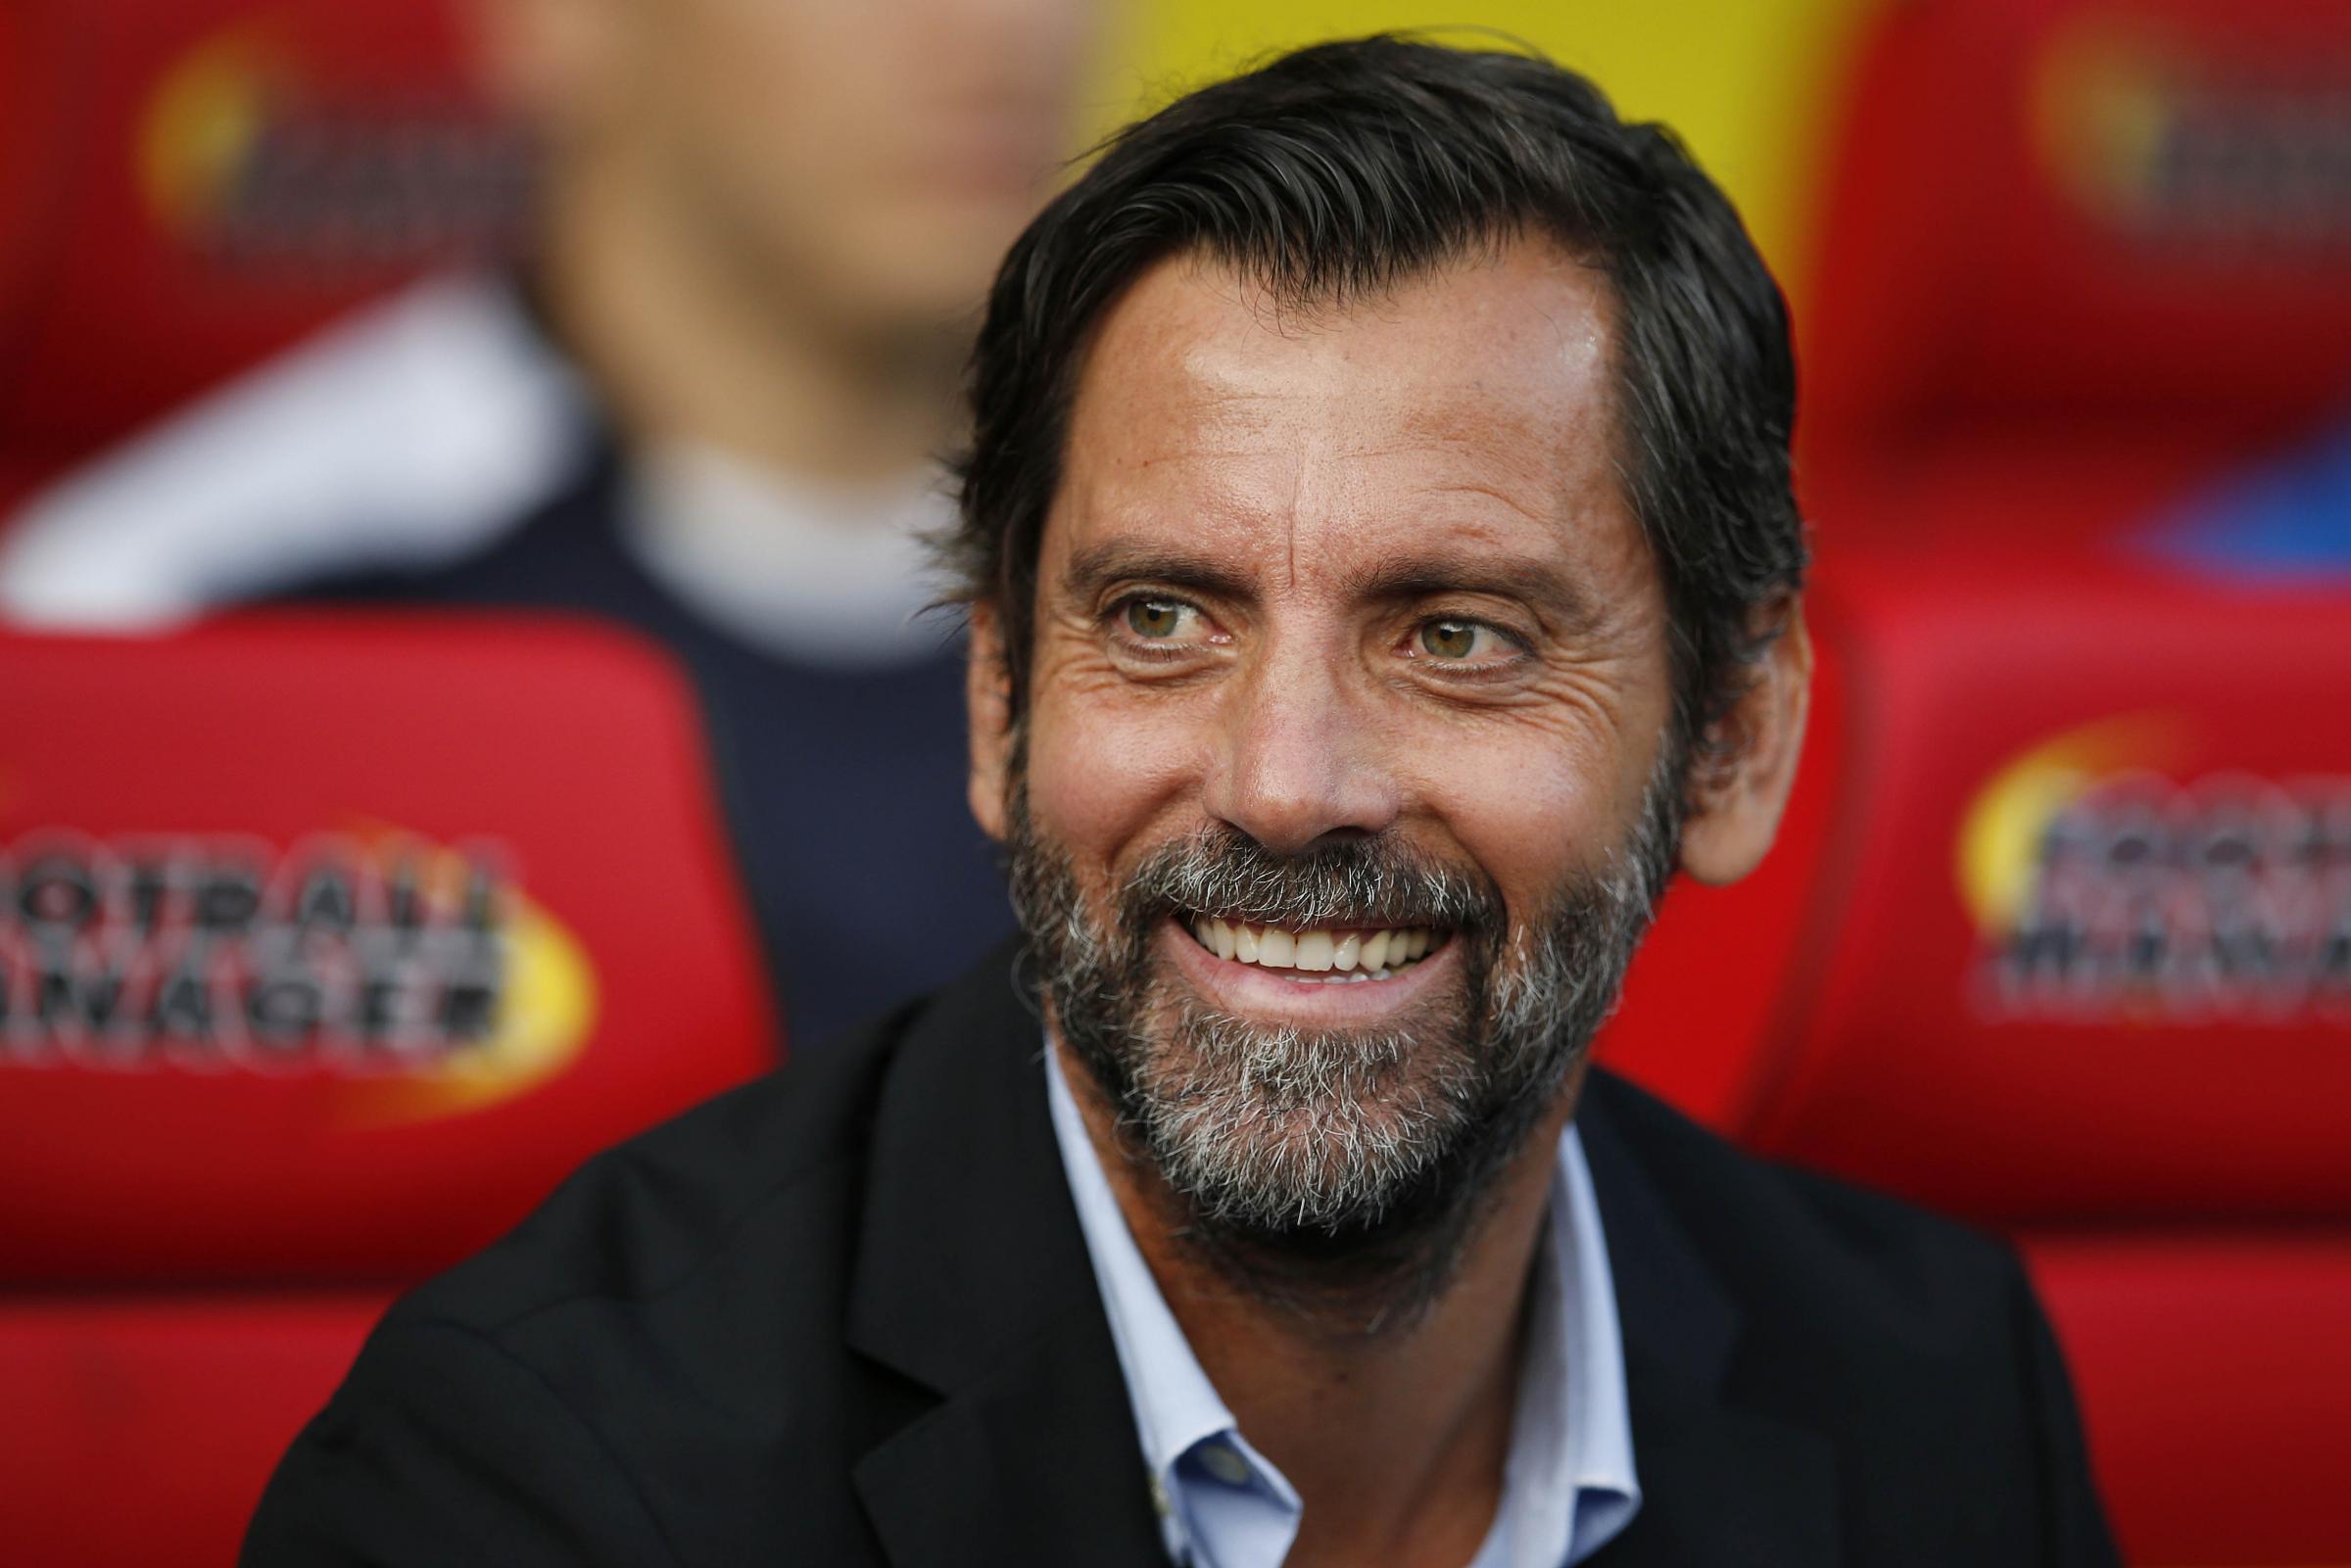 Berita Bola Terkini : Cerita Pelatih Watford tentang David de Gea